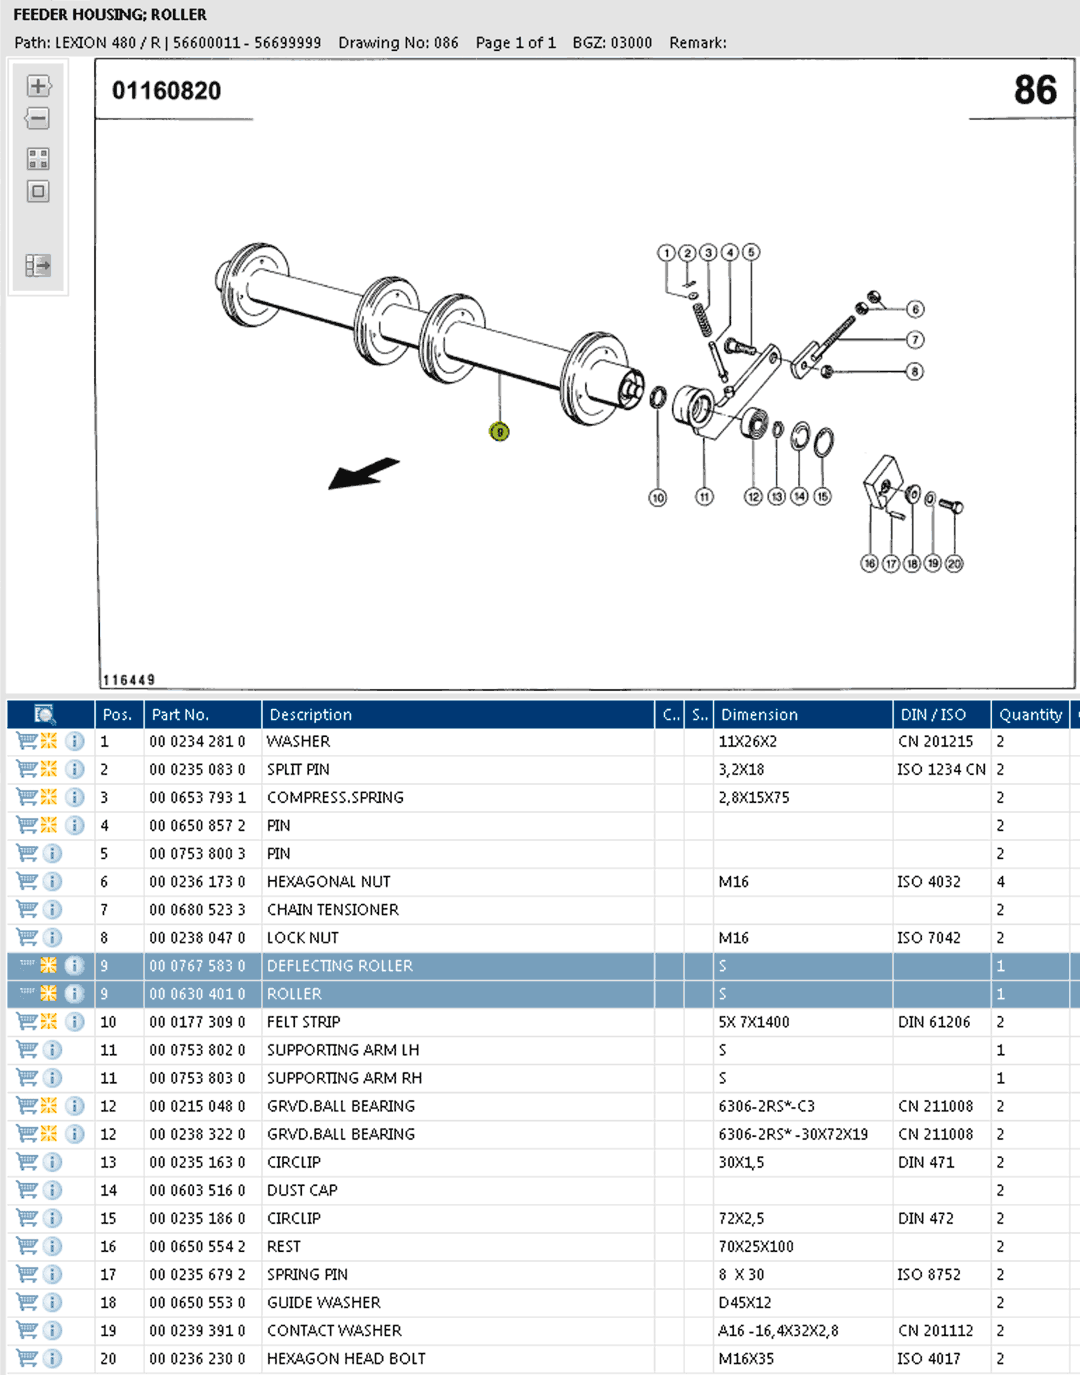 Lexion 480R parts and schemes - feeder housing - roller